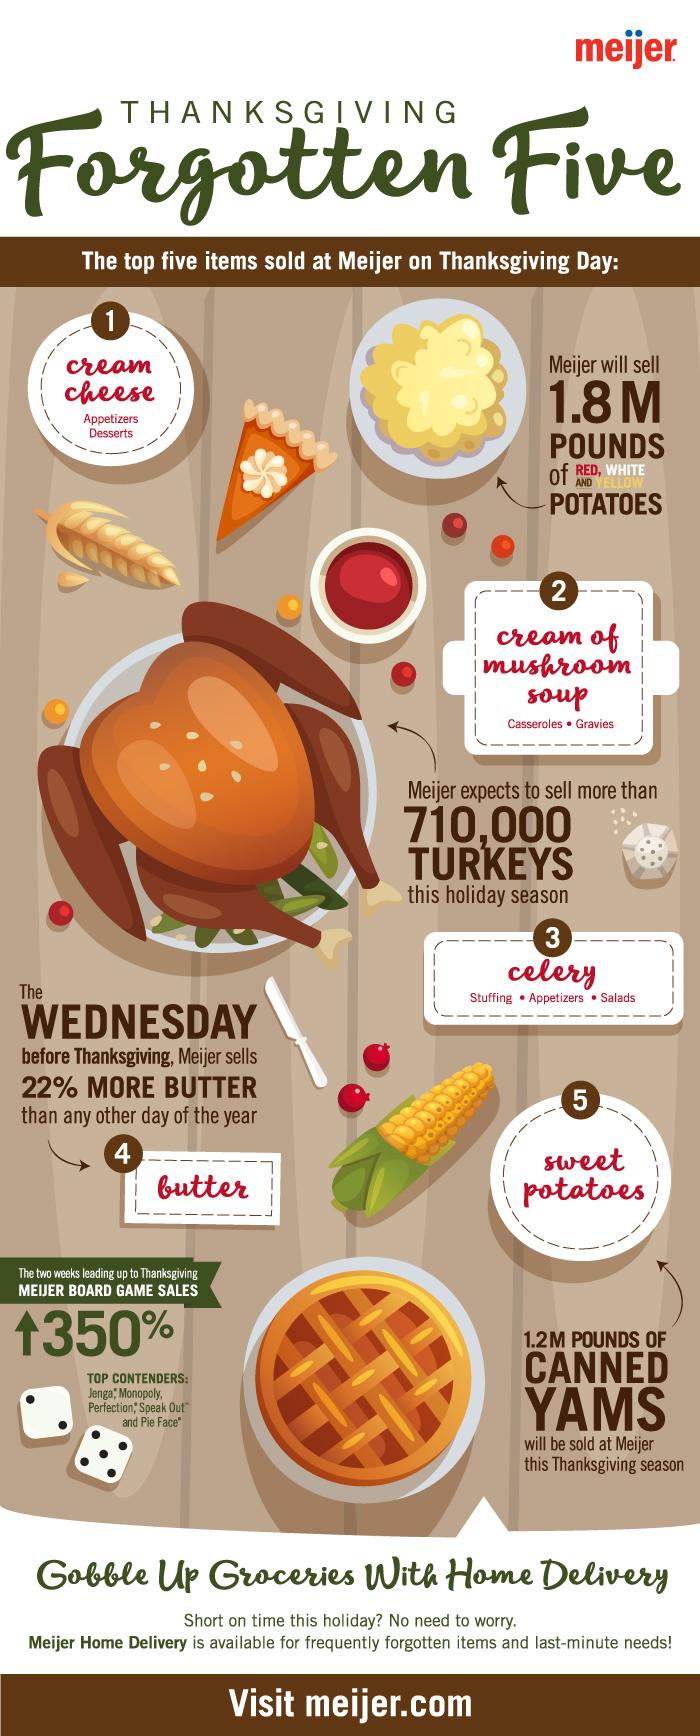 Meijer 2017 Turkey Infographic.jpg